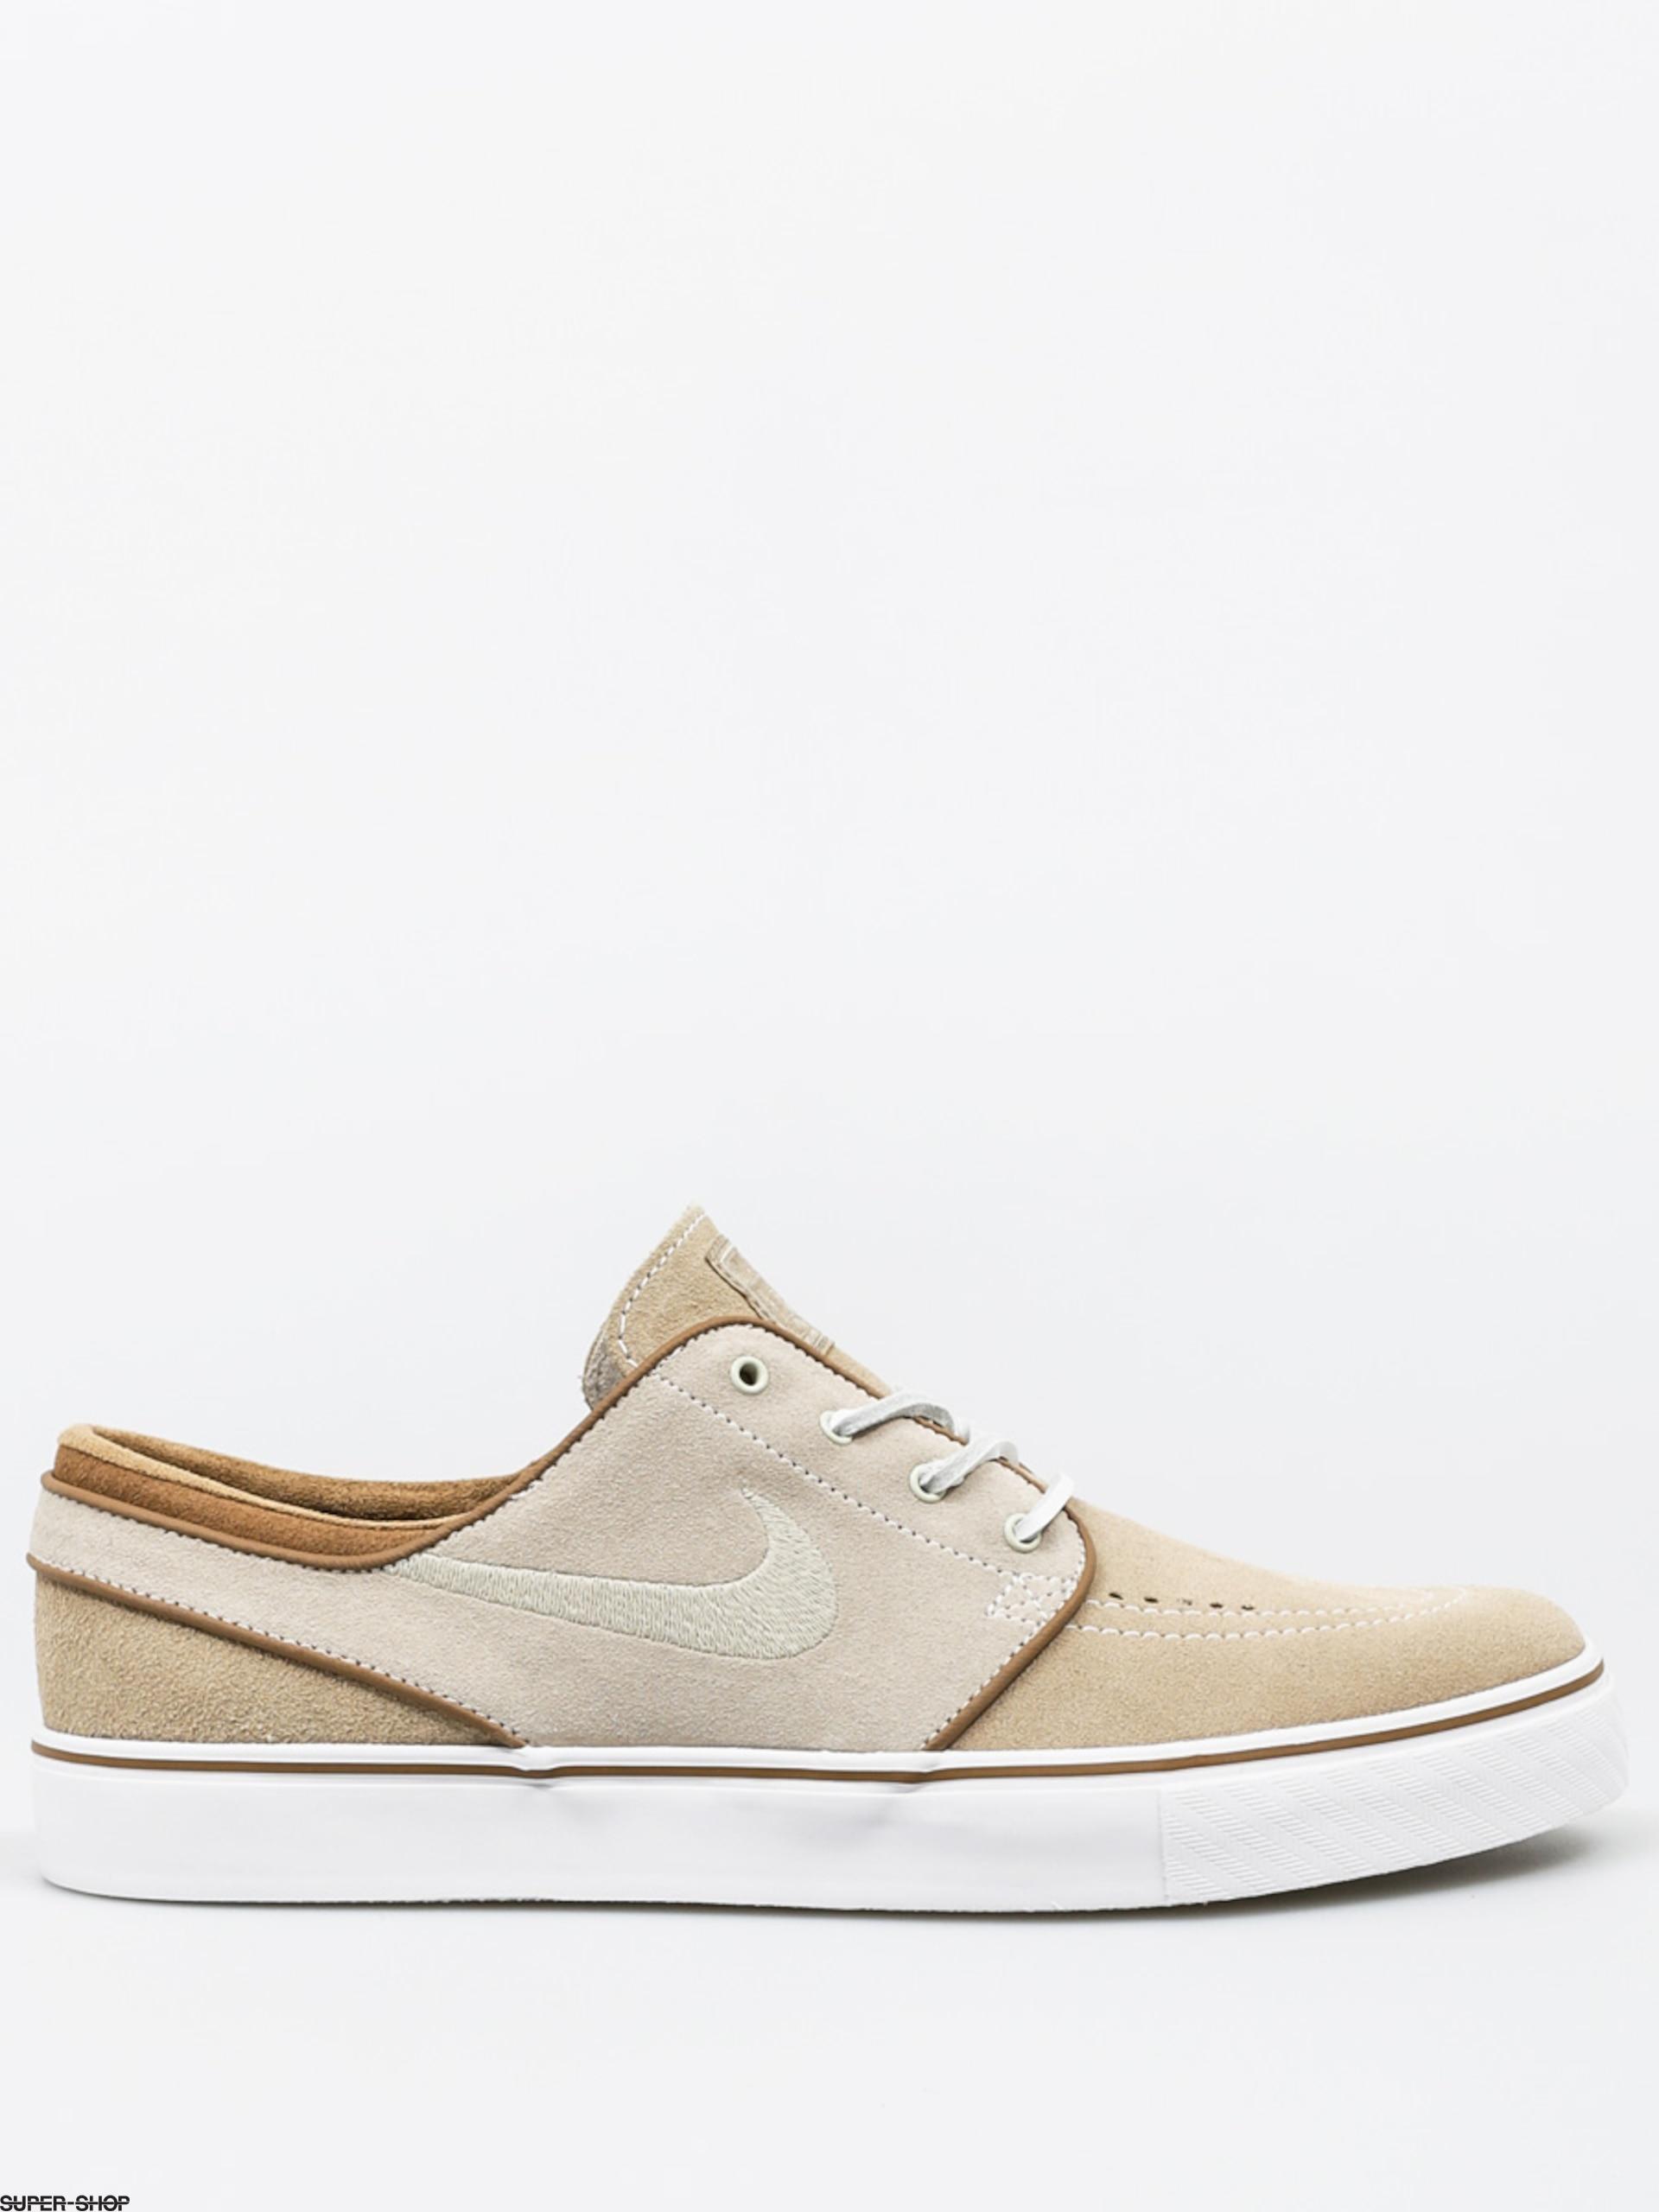 on sale 66335 70cdf Nike SB Shoes Zoom Stefan Janoski Og (reed reed stone rocky tan)